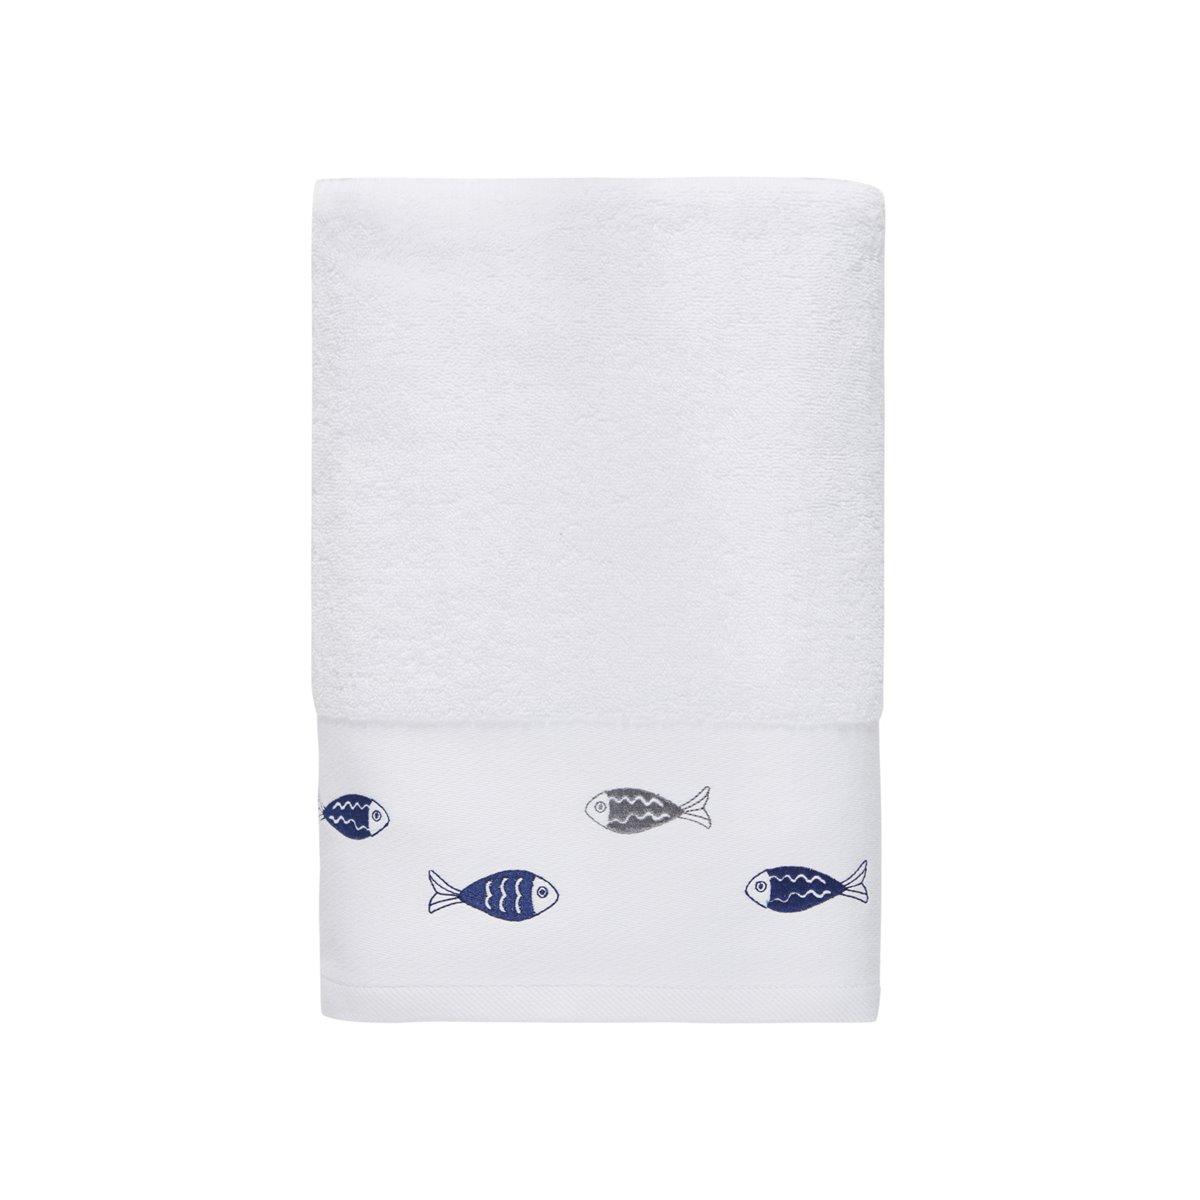 Drap de bain Blanc 70x140 cm